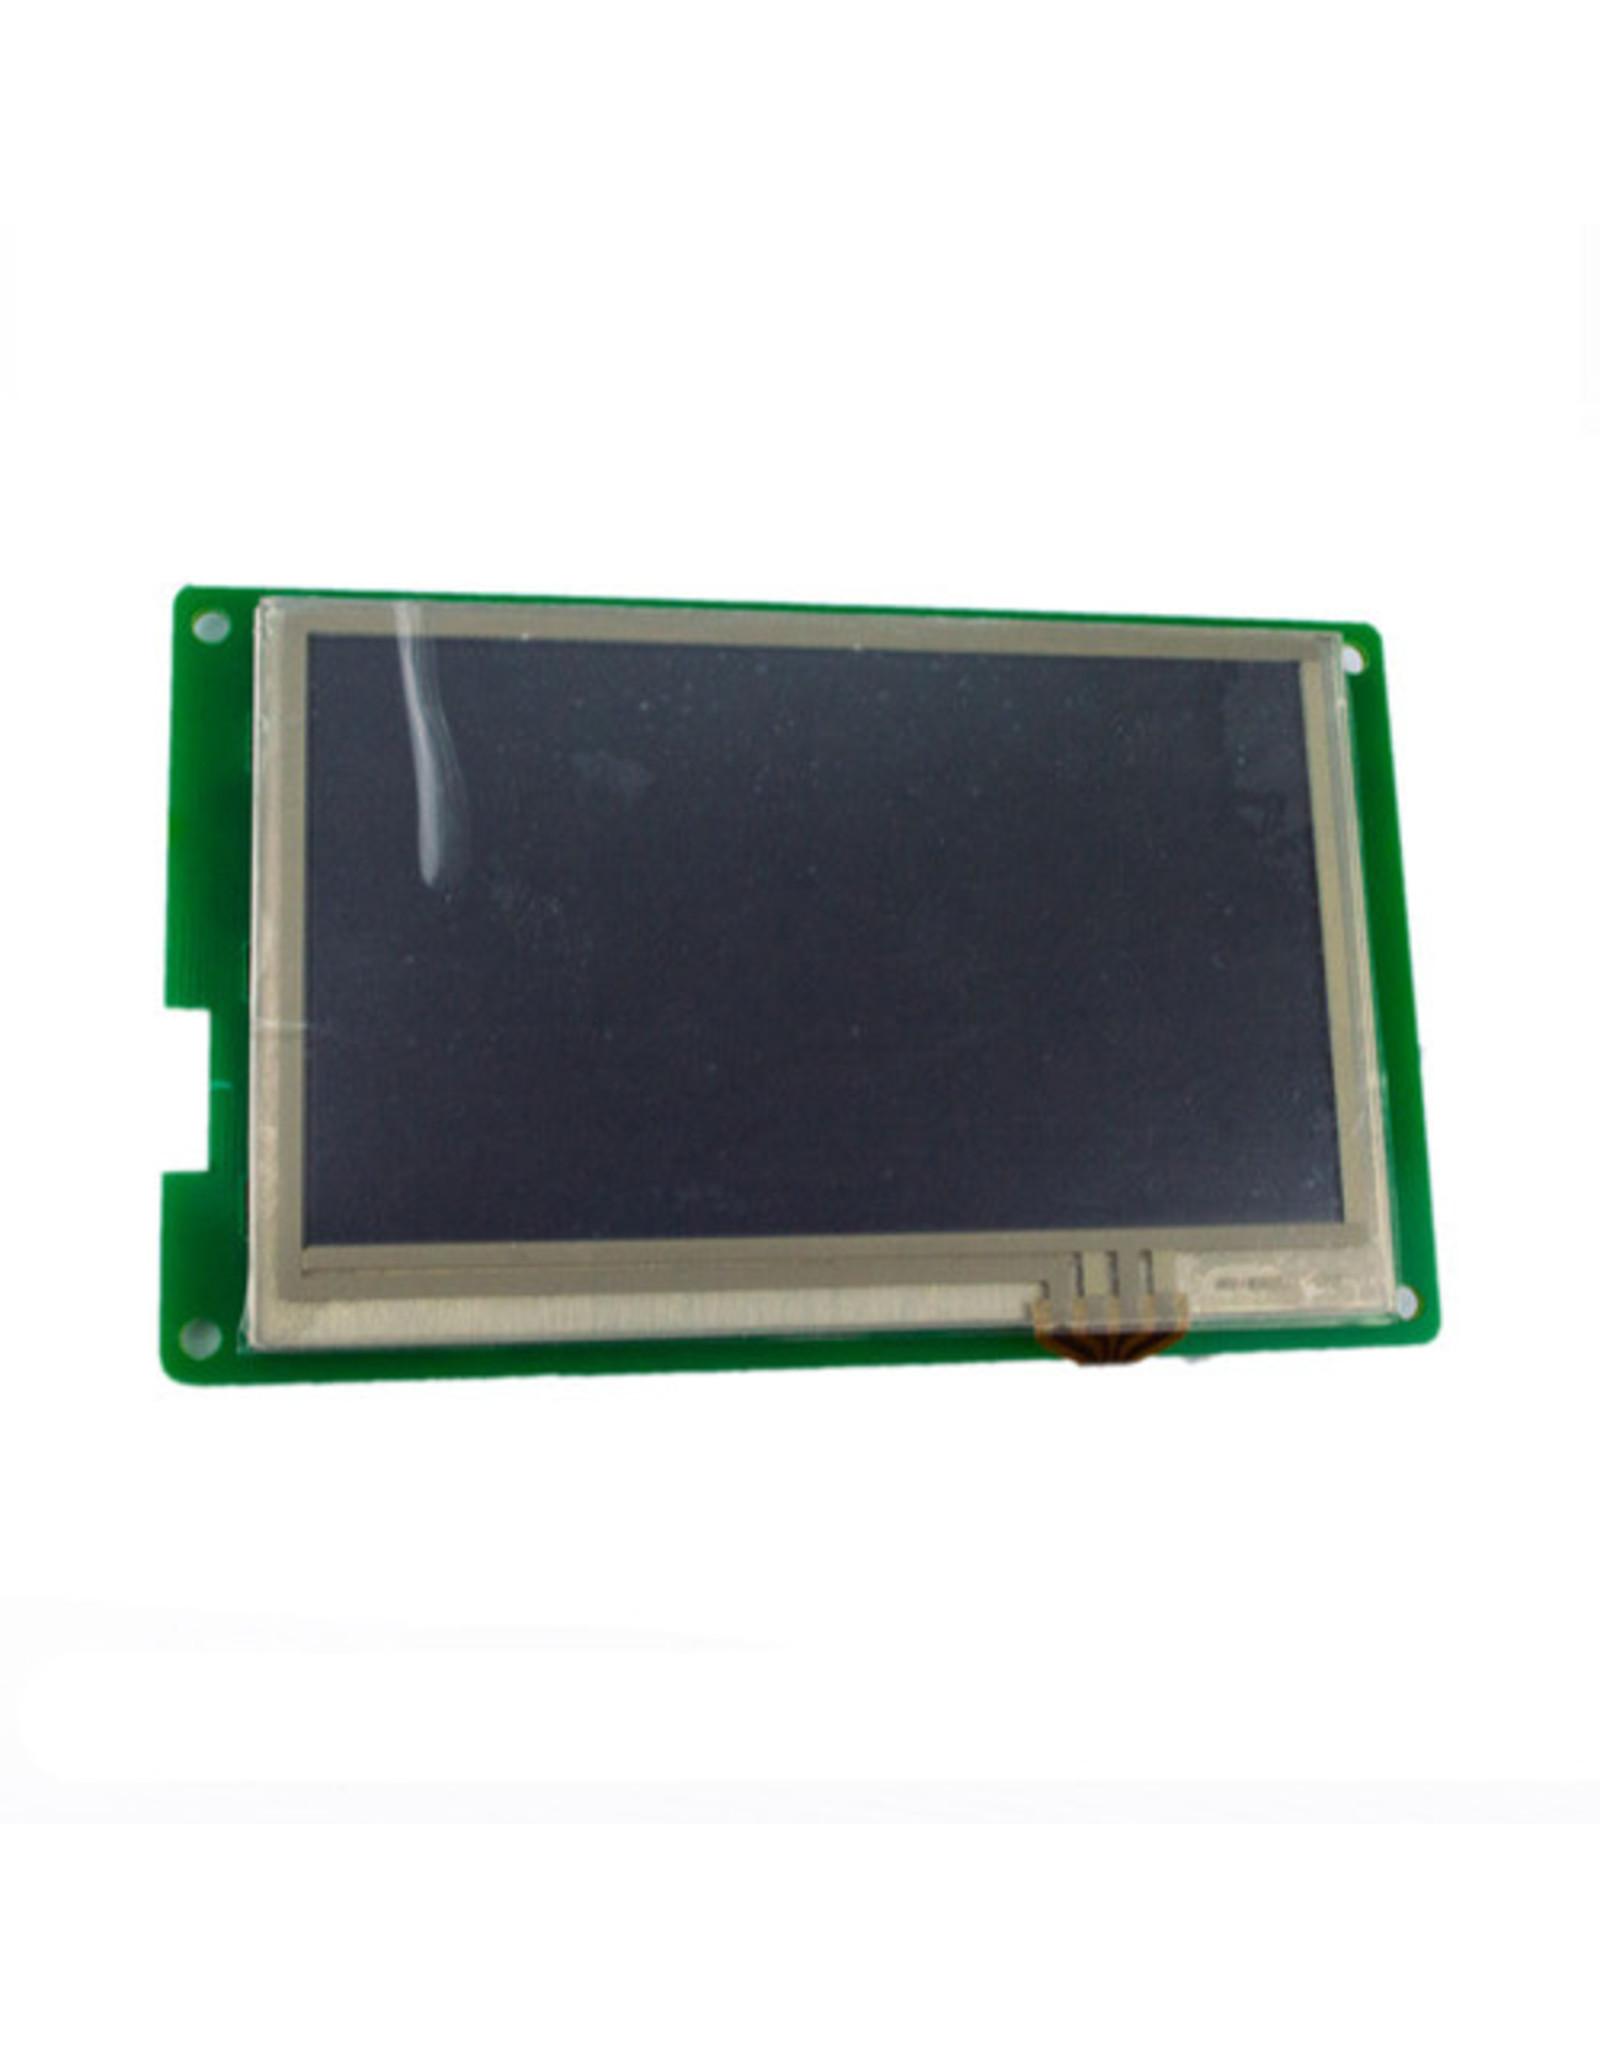 Wanhao Wanhao Touchscreen for Duplicator i3 Plus / i3 Plus Mark 2 / Duplicator 7